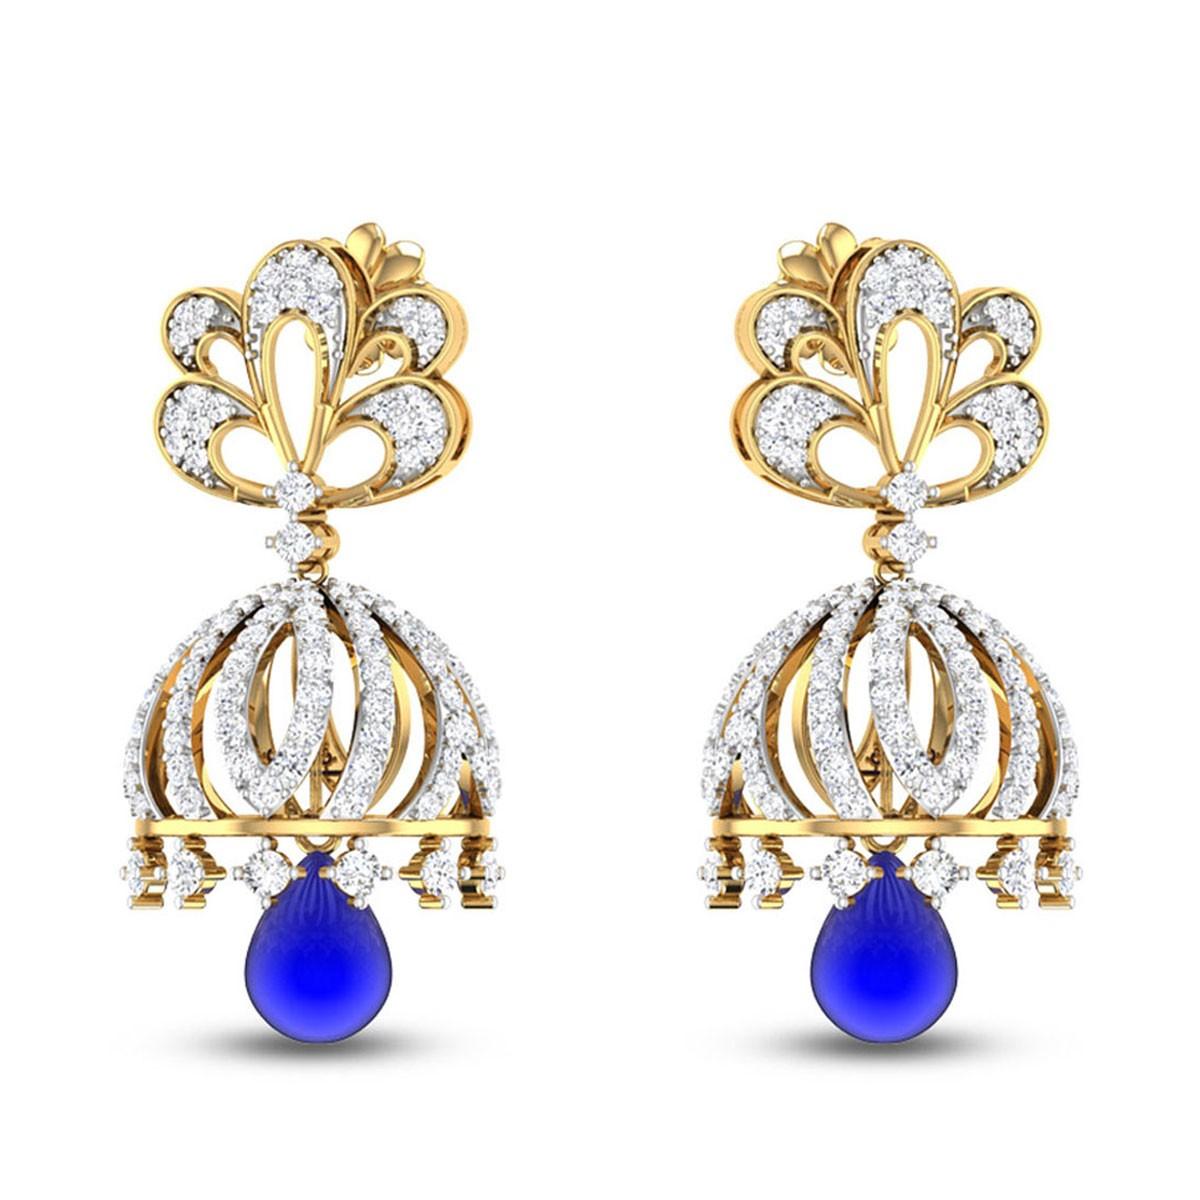 Heliotrope Diamond Earrings